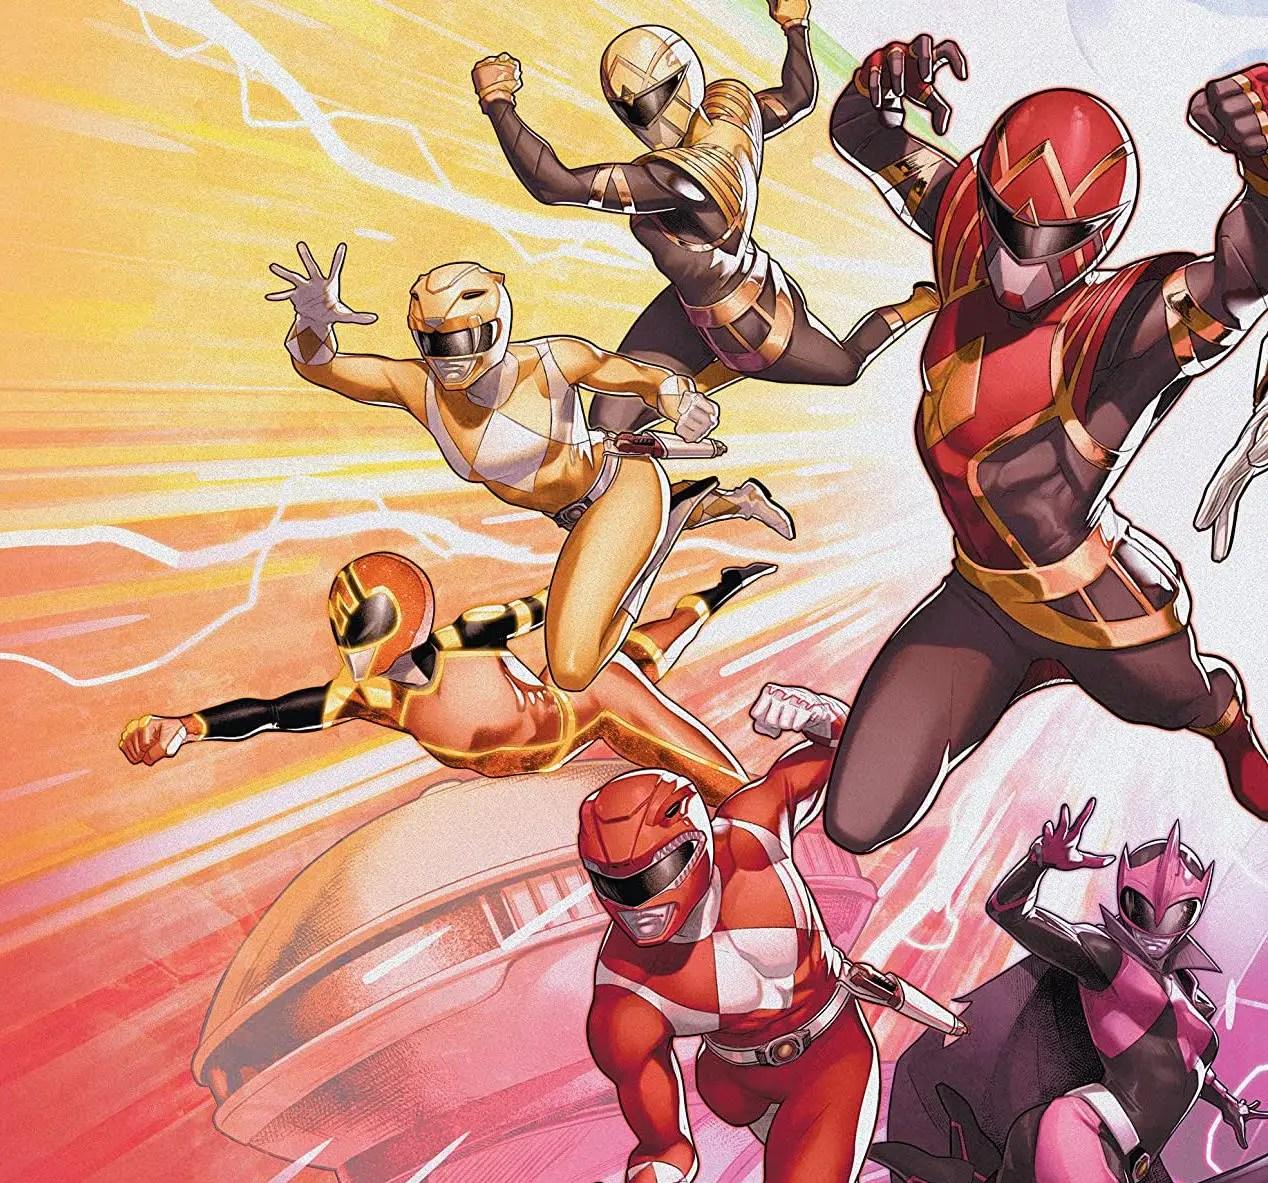 Mighty Morphin' Power Rangers #50